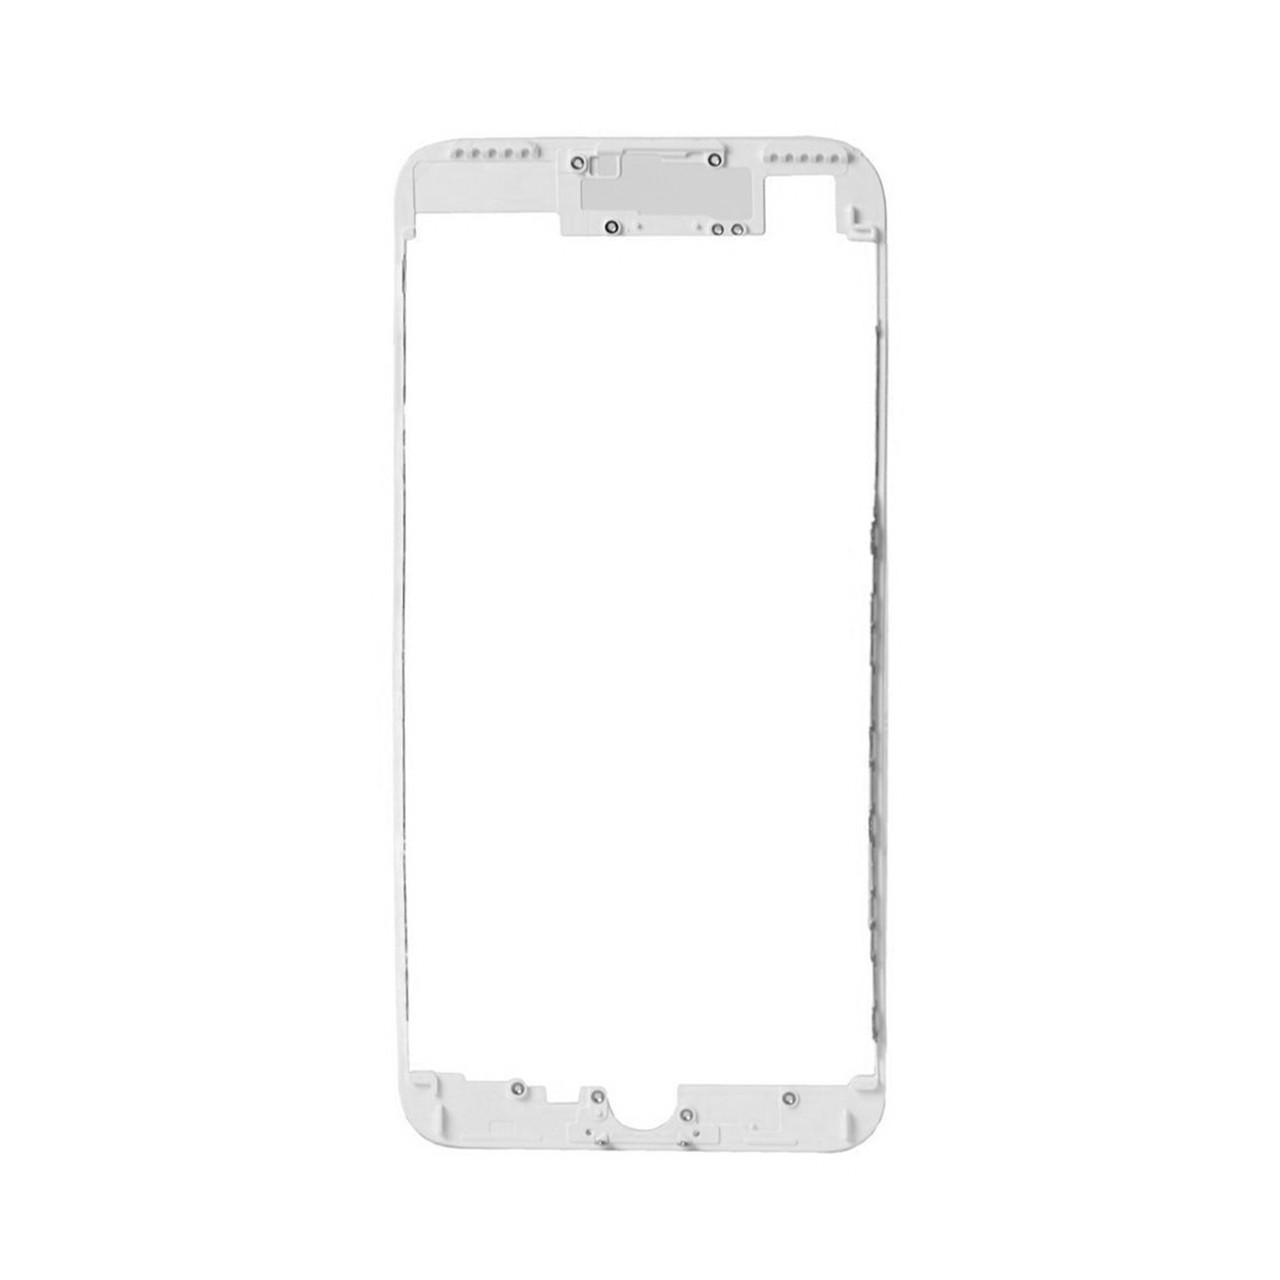 Рамка для дисплея Apple iPhone 7 Plus AAA внутренняя пустая White (8)